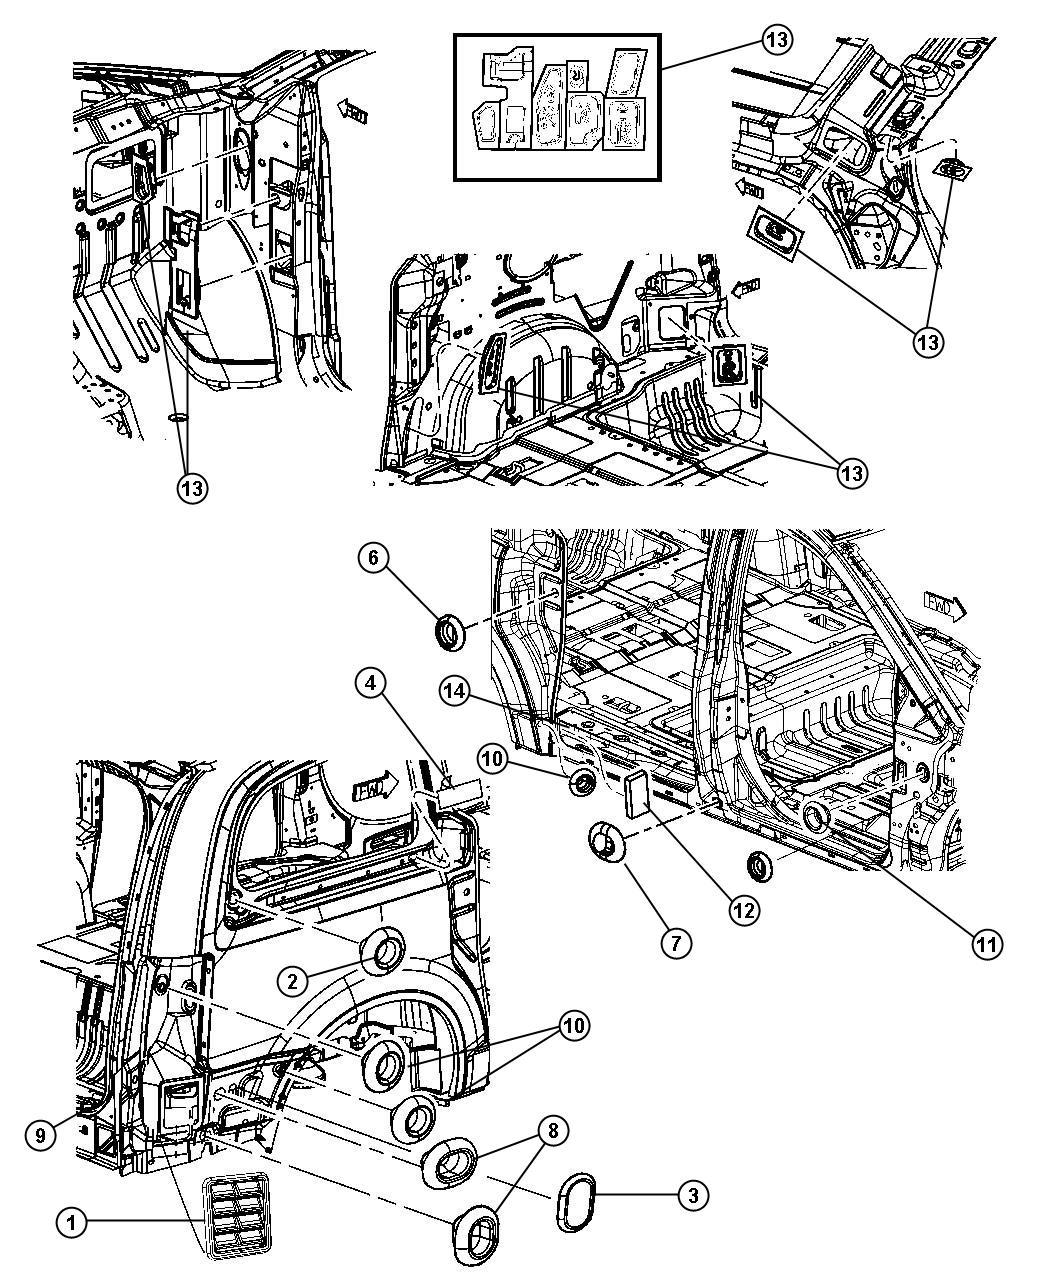 2011 Dodge Grand Caravan Plug Body 25 4mm X 38 1mm D Wiring Diagram